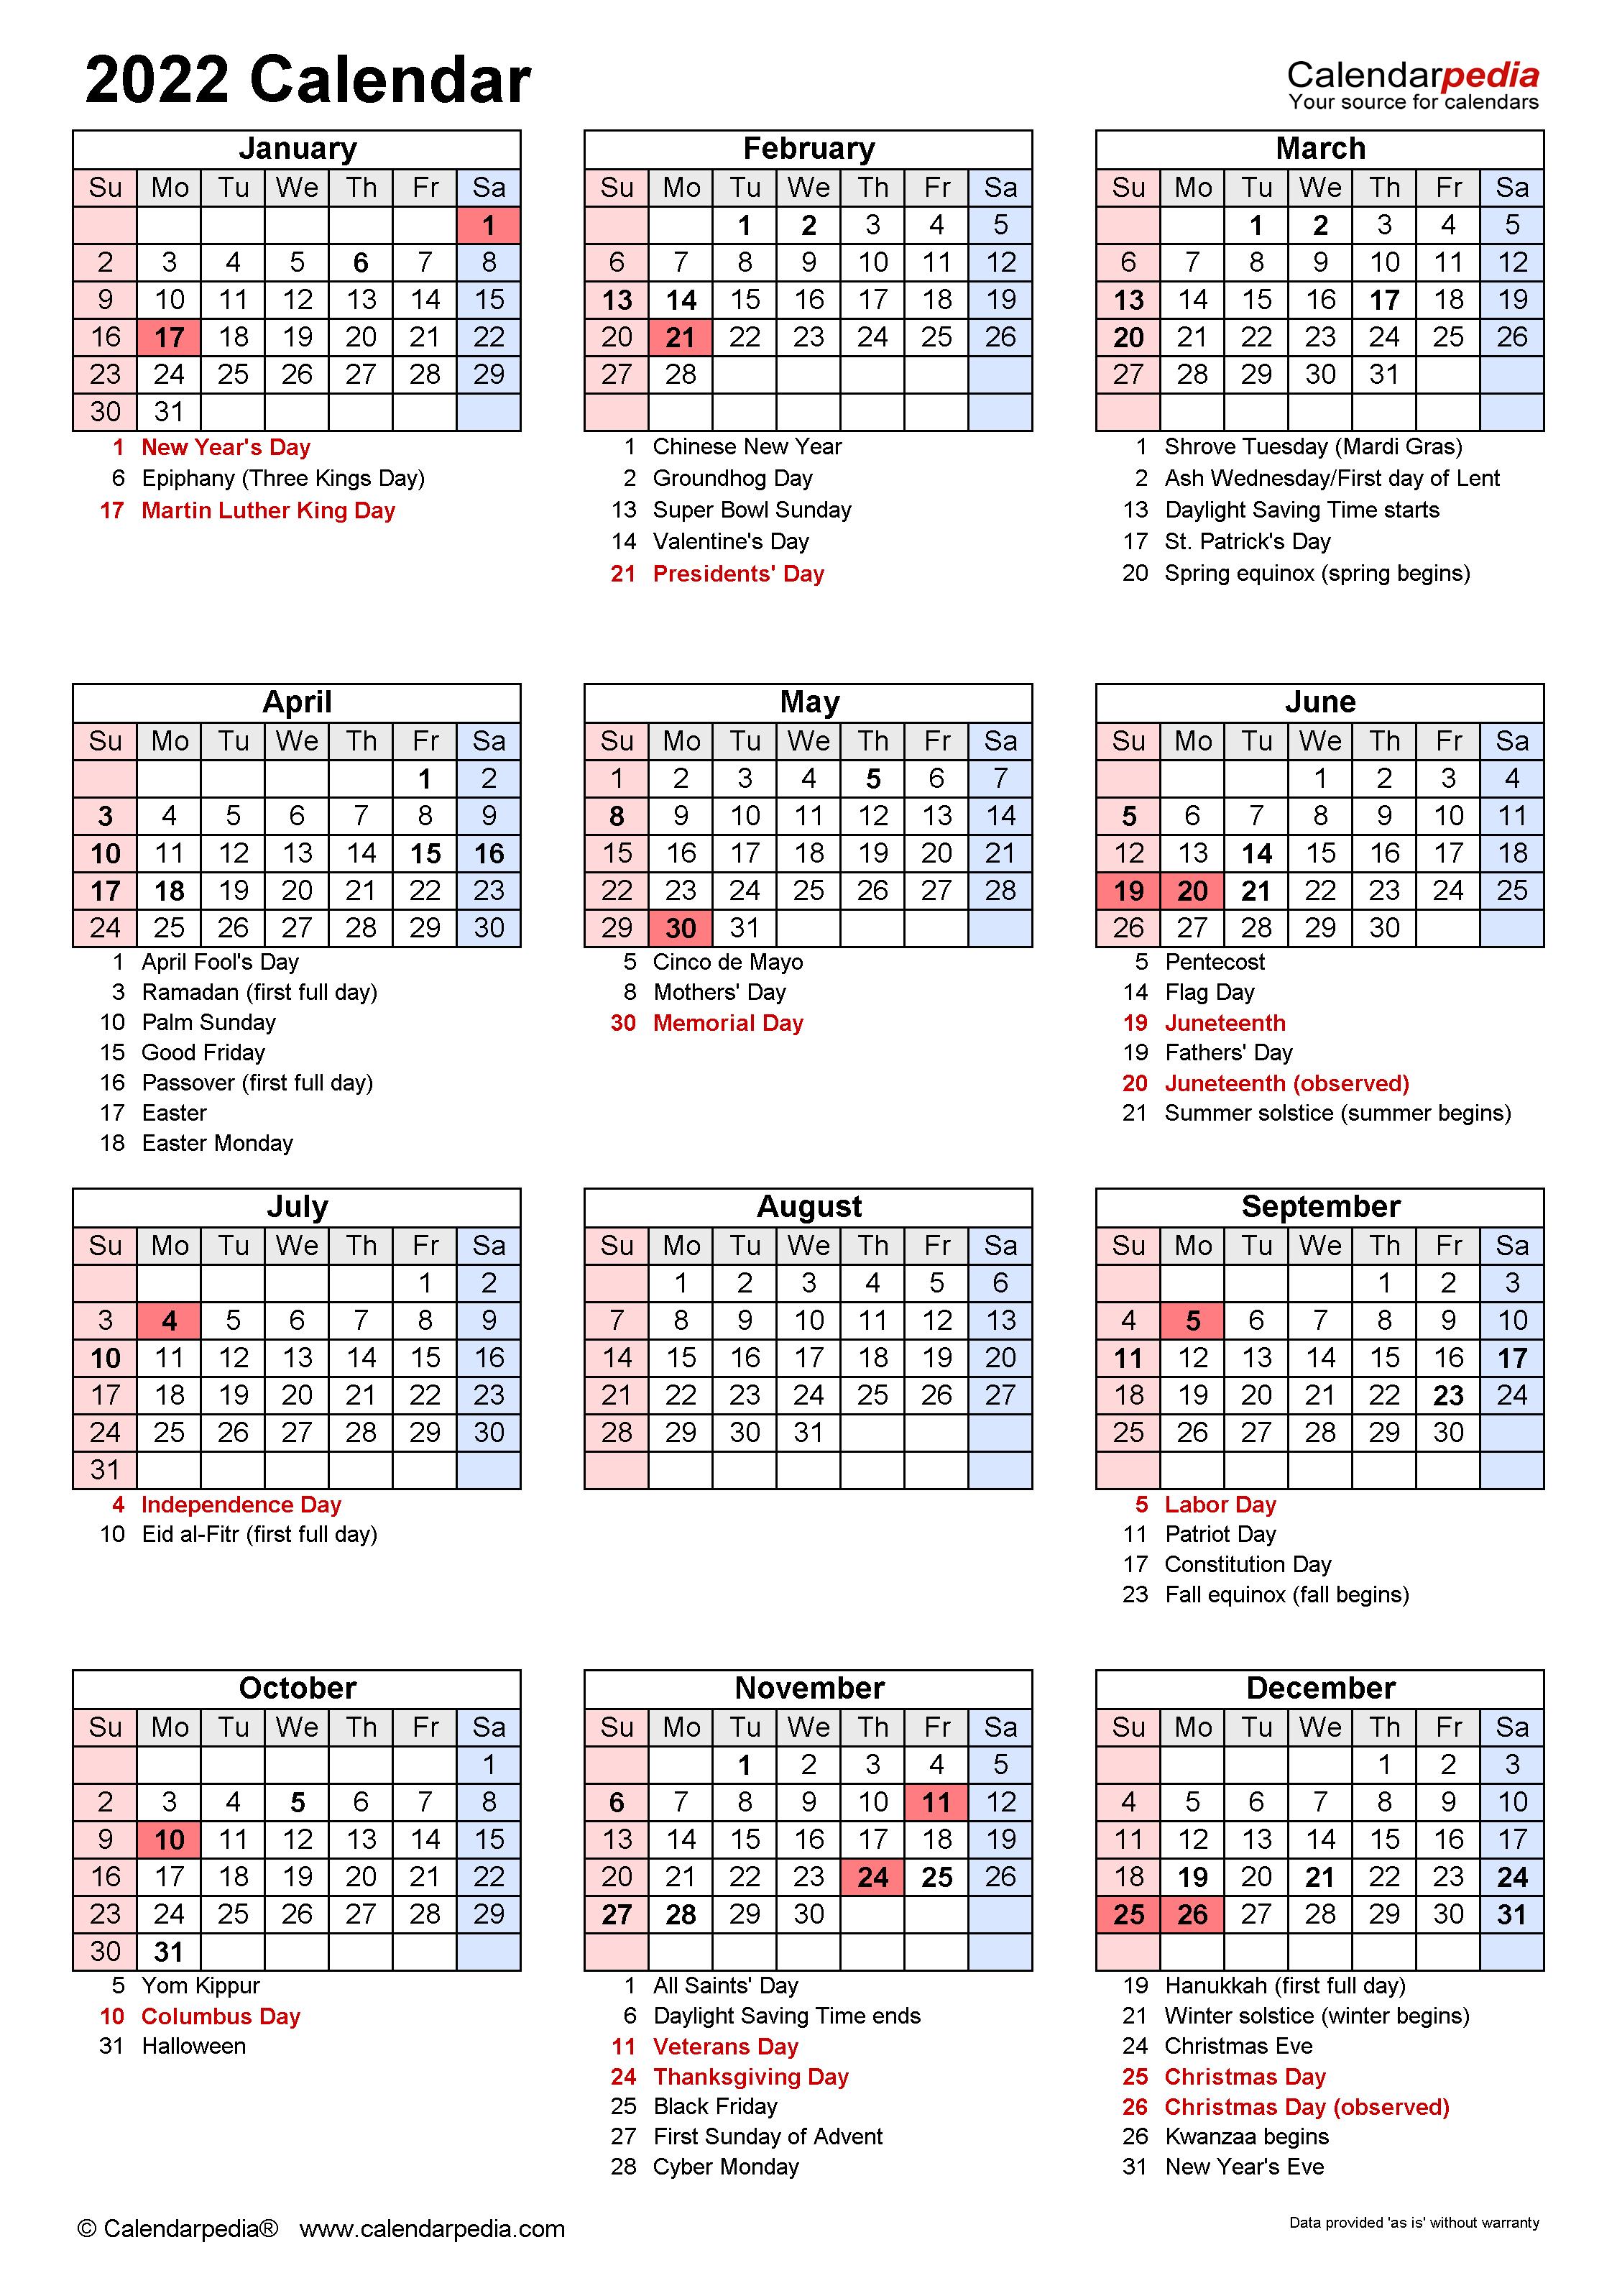 Chinese New Year Calendar 2022.2022 Calendar Free Printable Excel Templates Calendarpedia